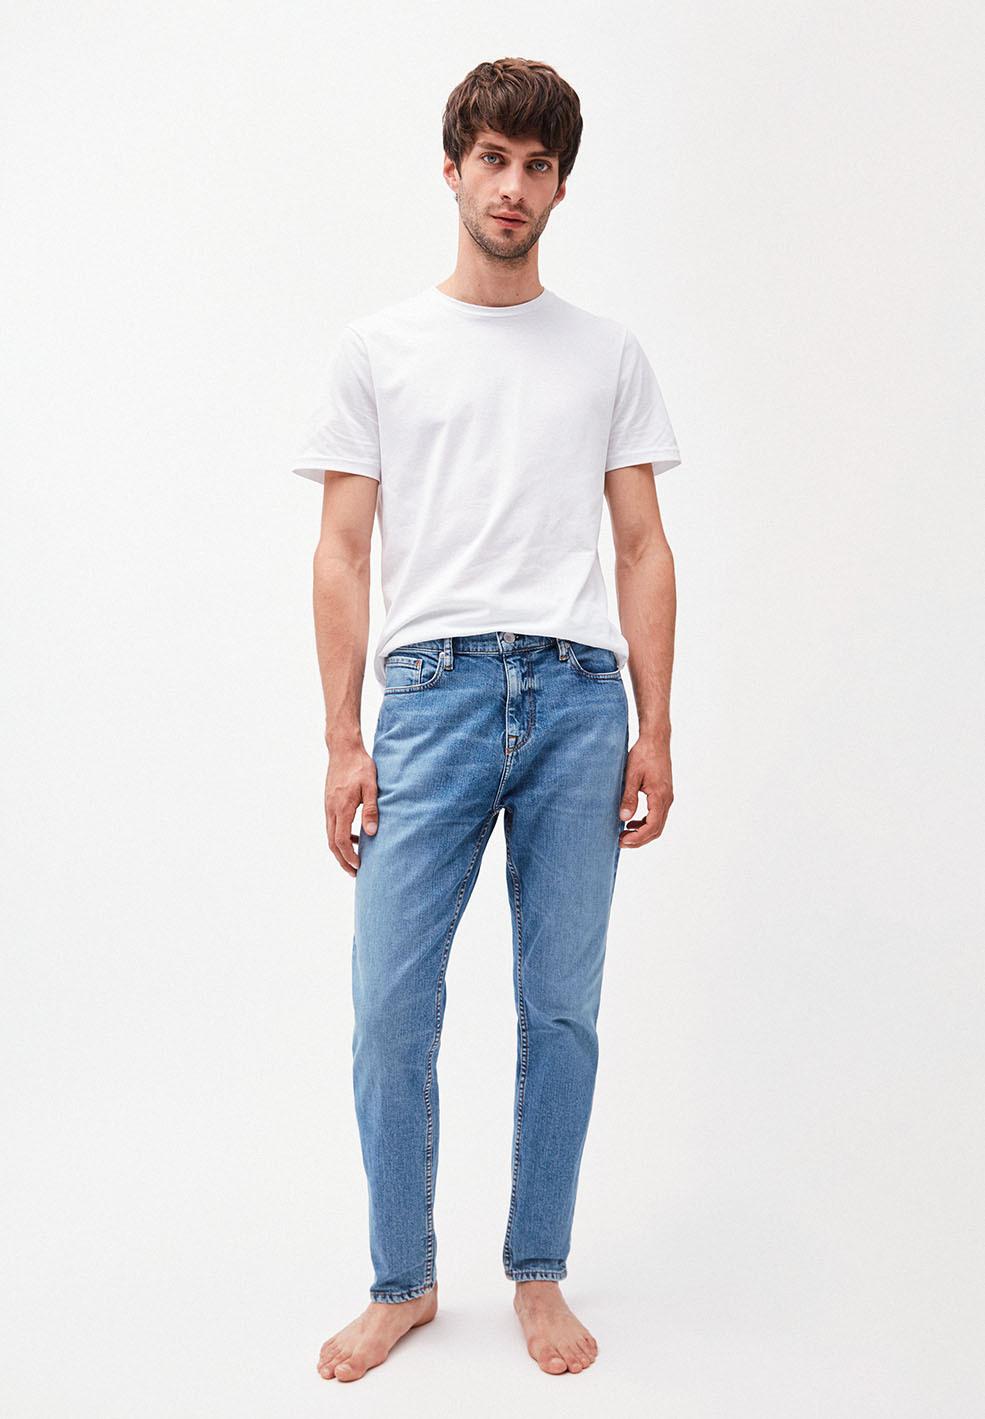 ARMEDANGELS-AARO-Tapered-Fit-Denim-Jeans-brilliant-blue-4